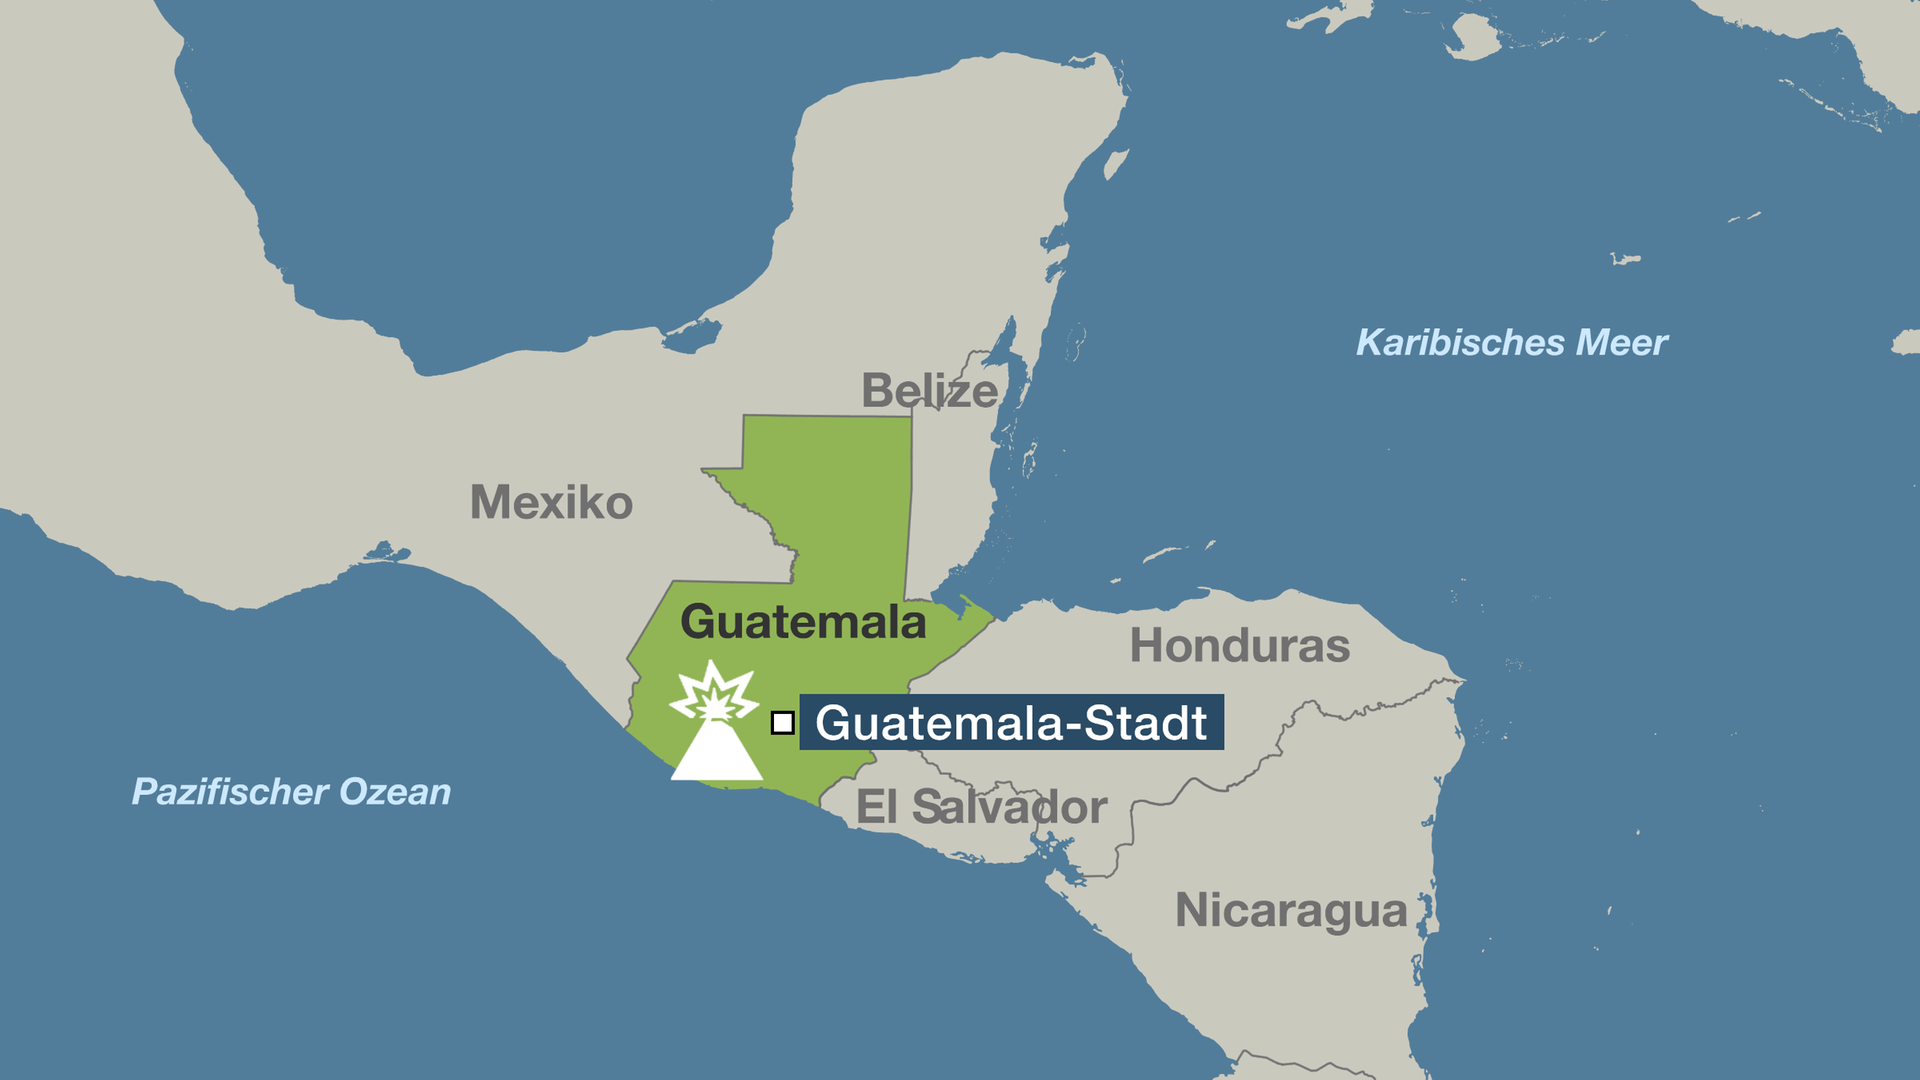 Guatemala Karte.Guatemala In Der Hölle Des Feuervulkans Zdfmediathek